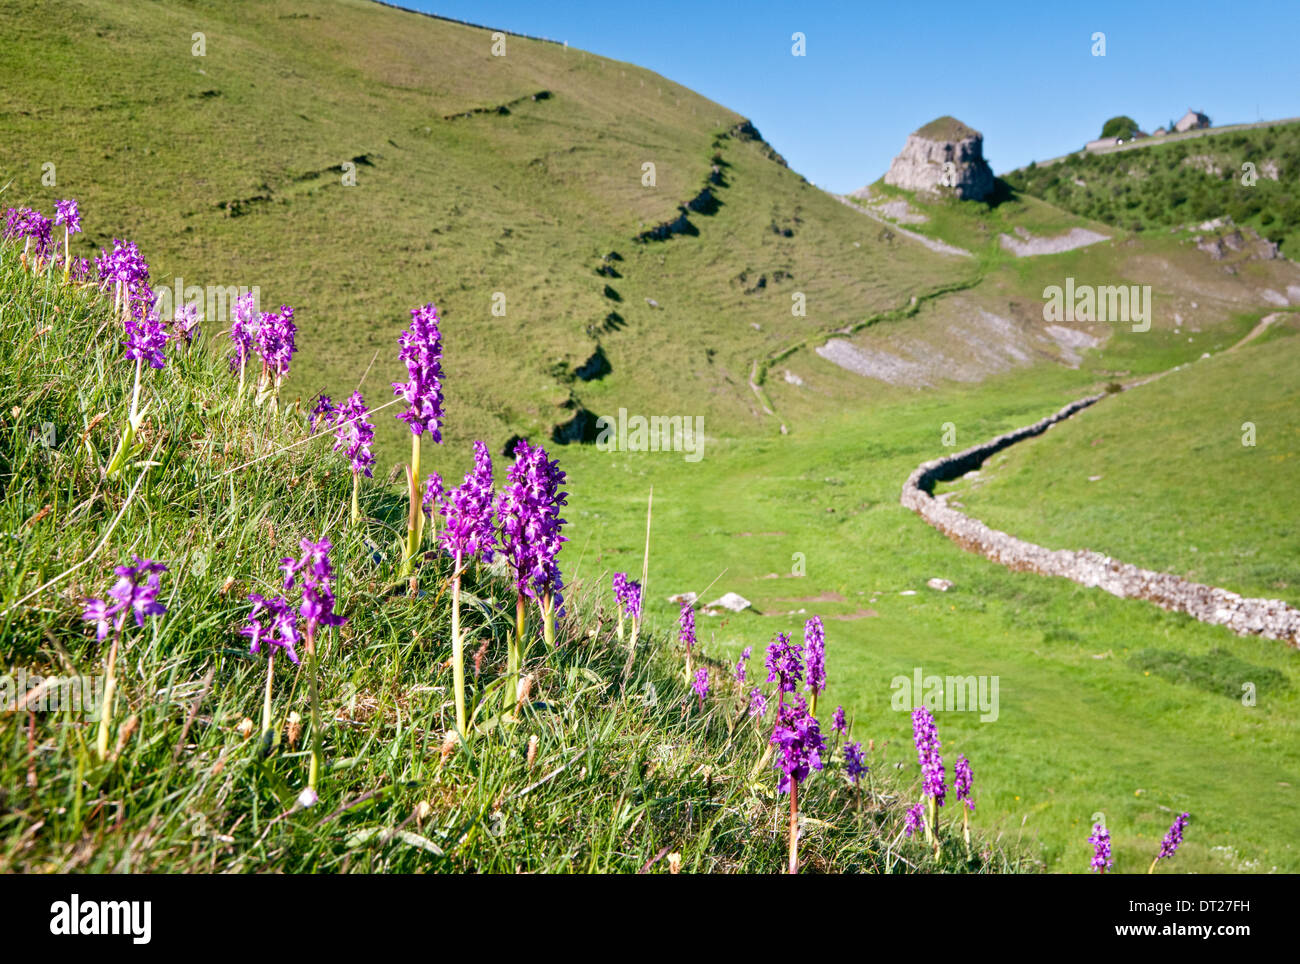 Frühe lila Orchideen & Peter Stein, Cressbrook Dale, Peak District National Park, Derbyshire, England, UK Stockbild